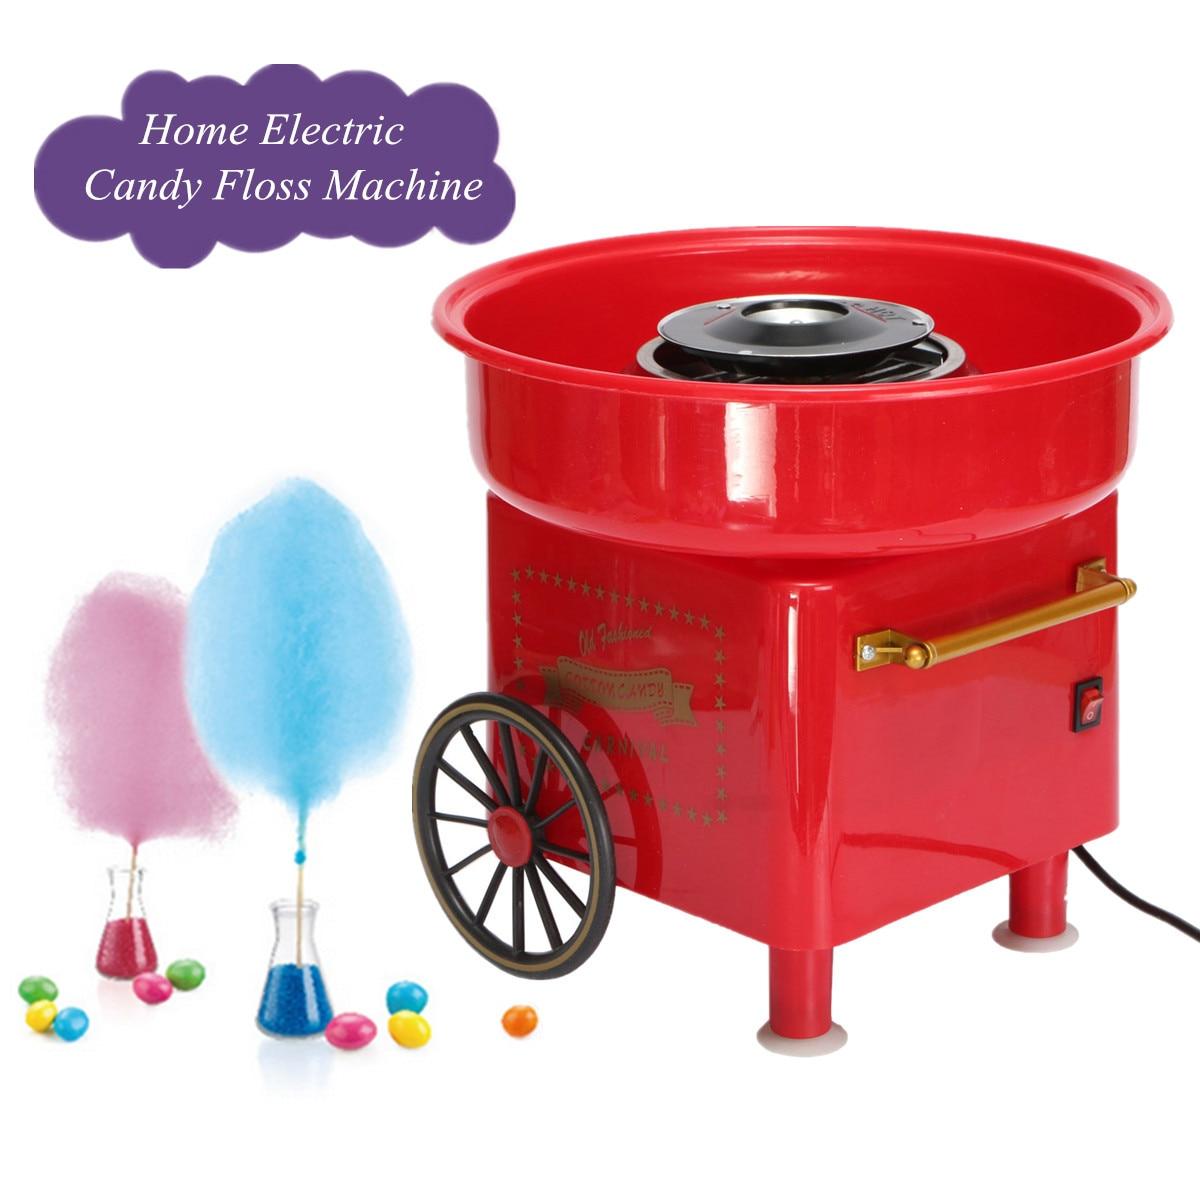 Mini Retro DIY Sweet Cotton Candy Machine Portable Electric Icing Machine Home Party Creatives Gift 450-550W 240V EU Plug